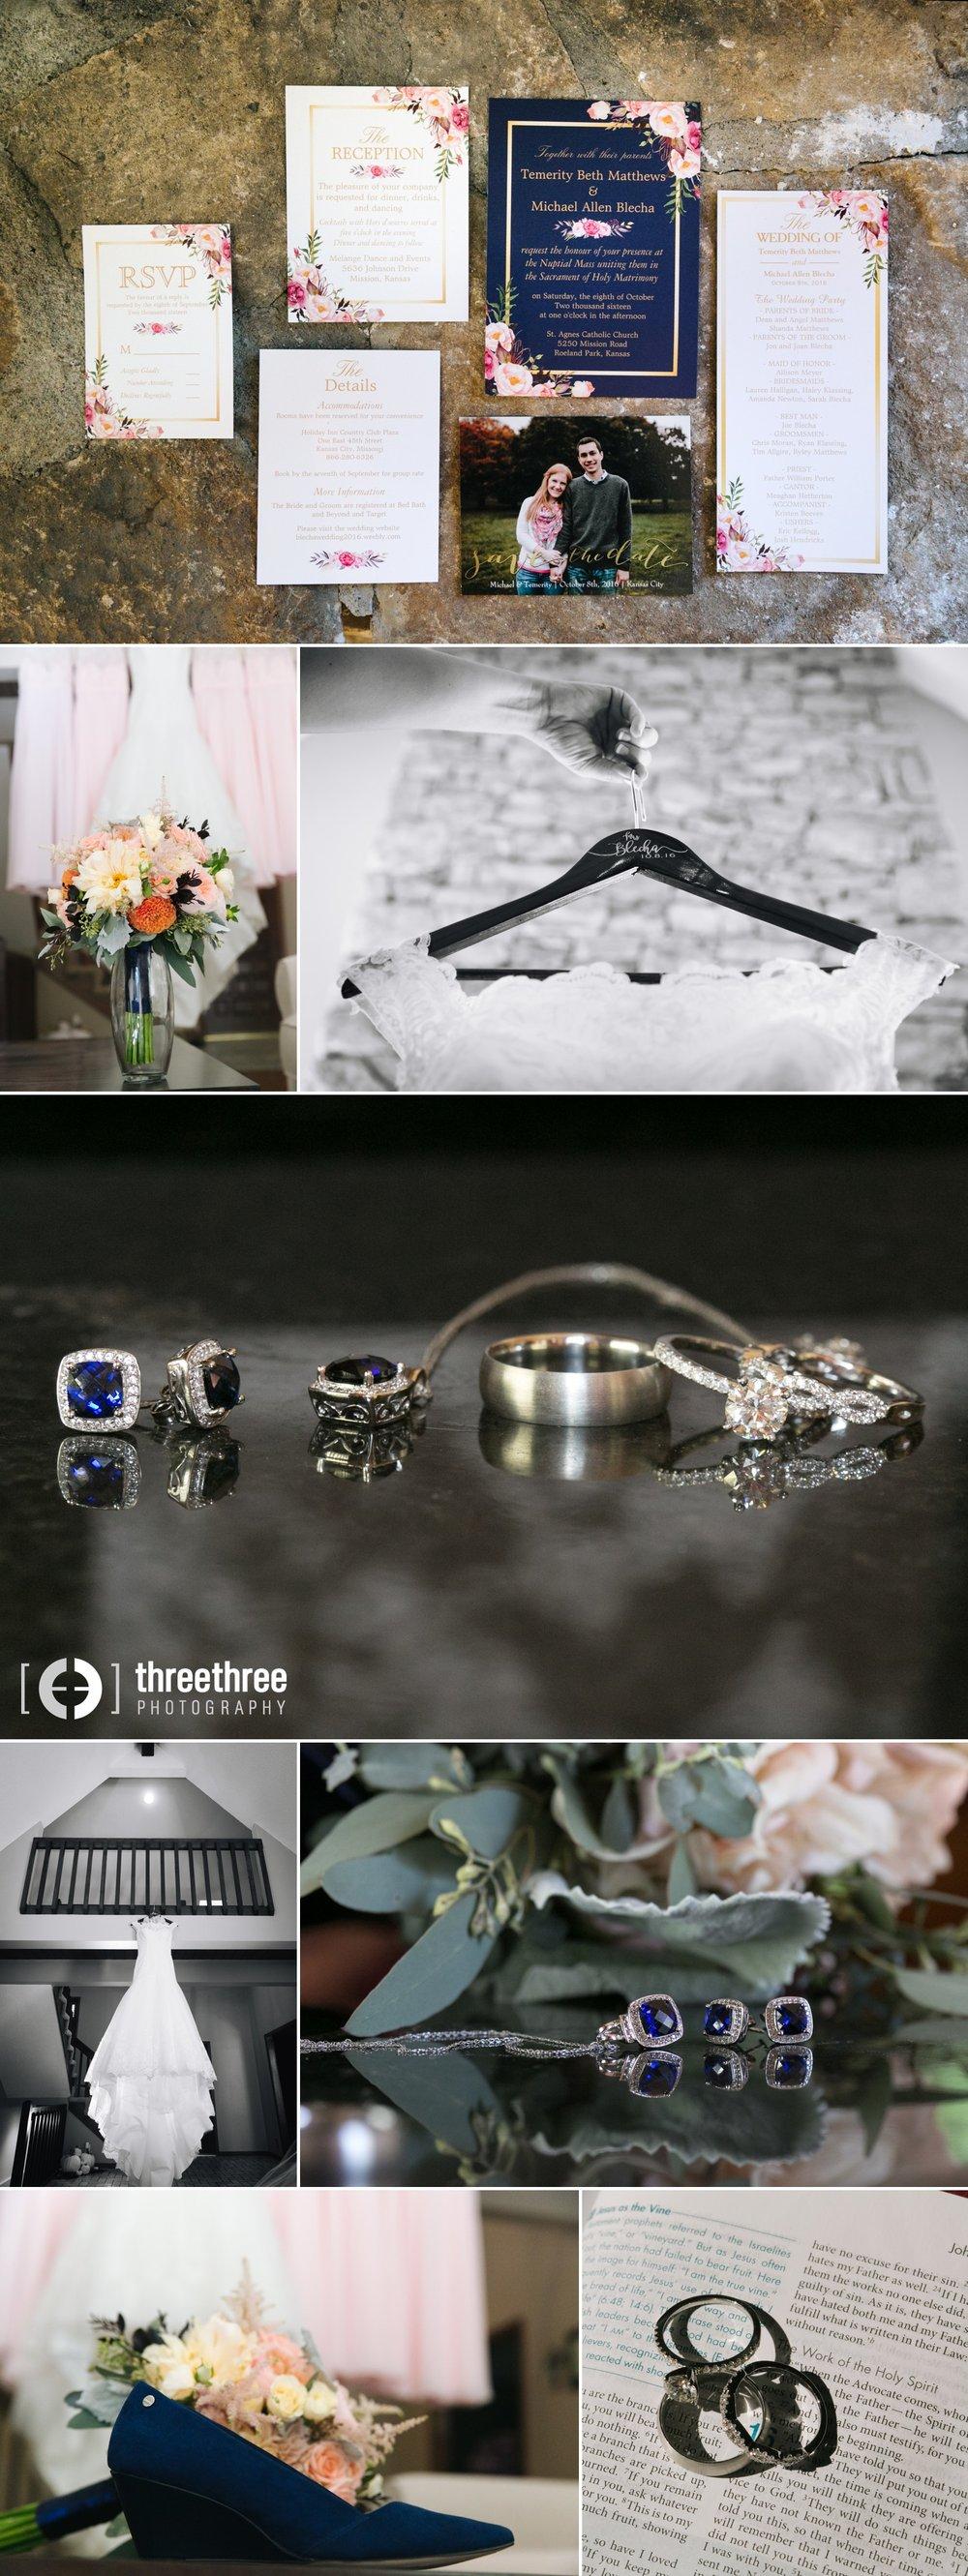 Temerity_KC Wedding Photography 1.jpg